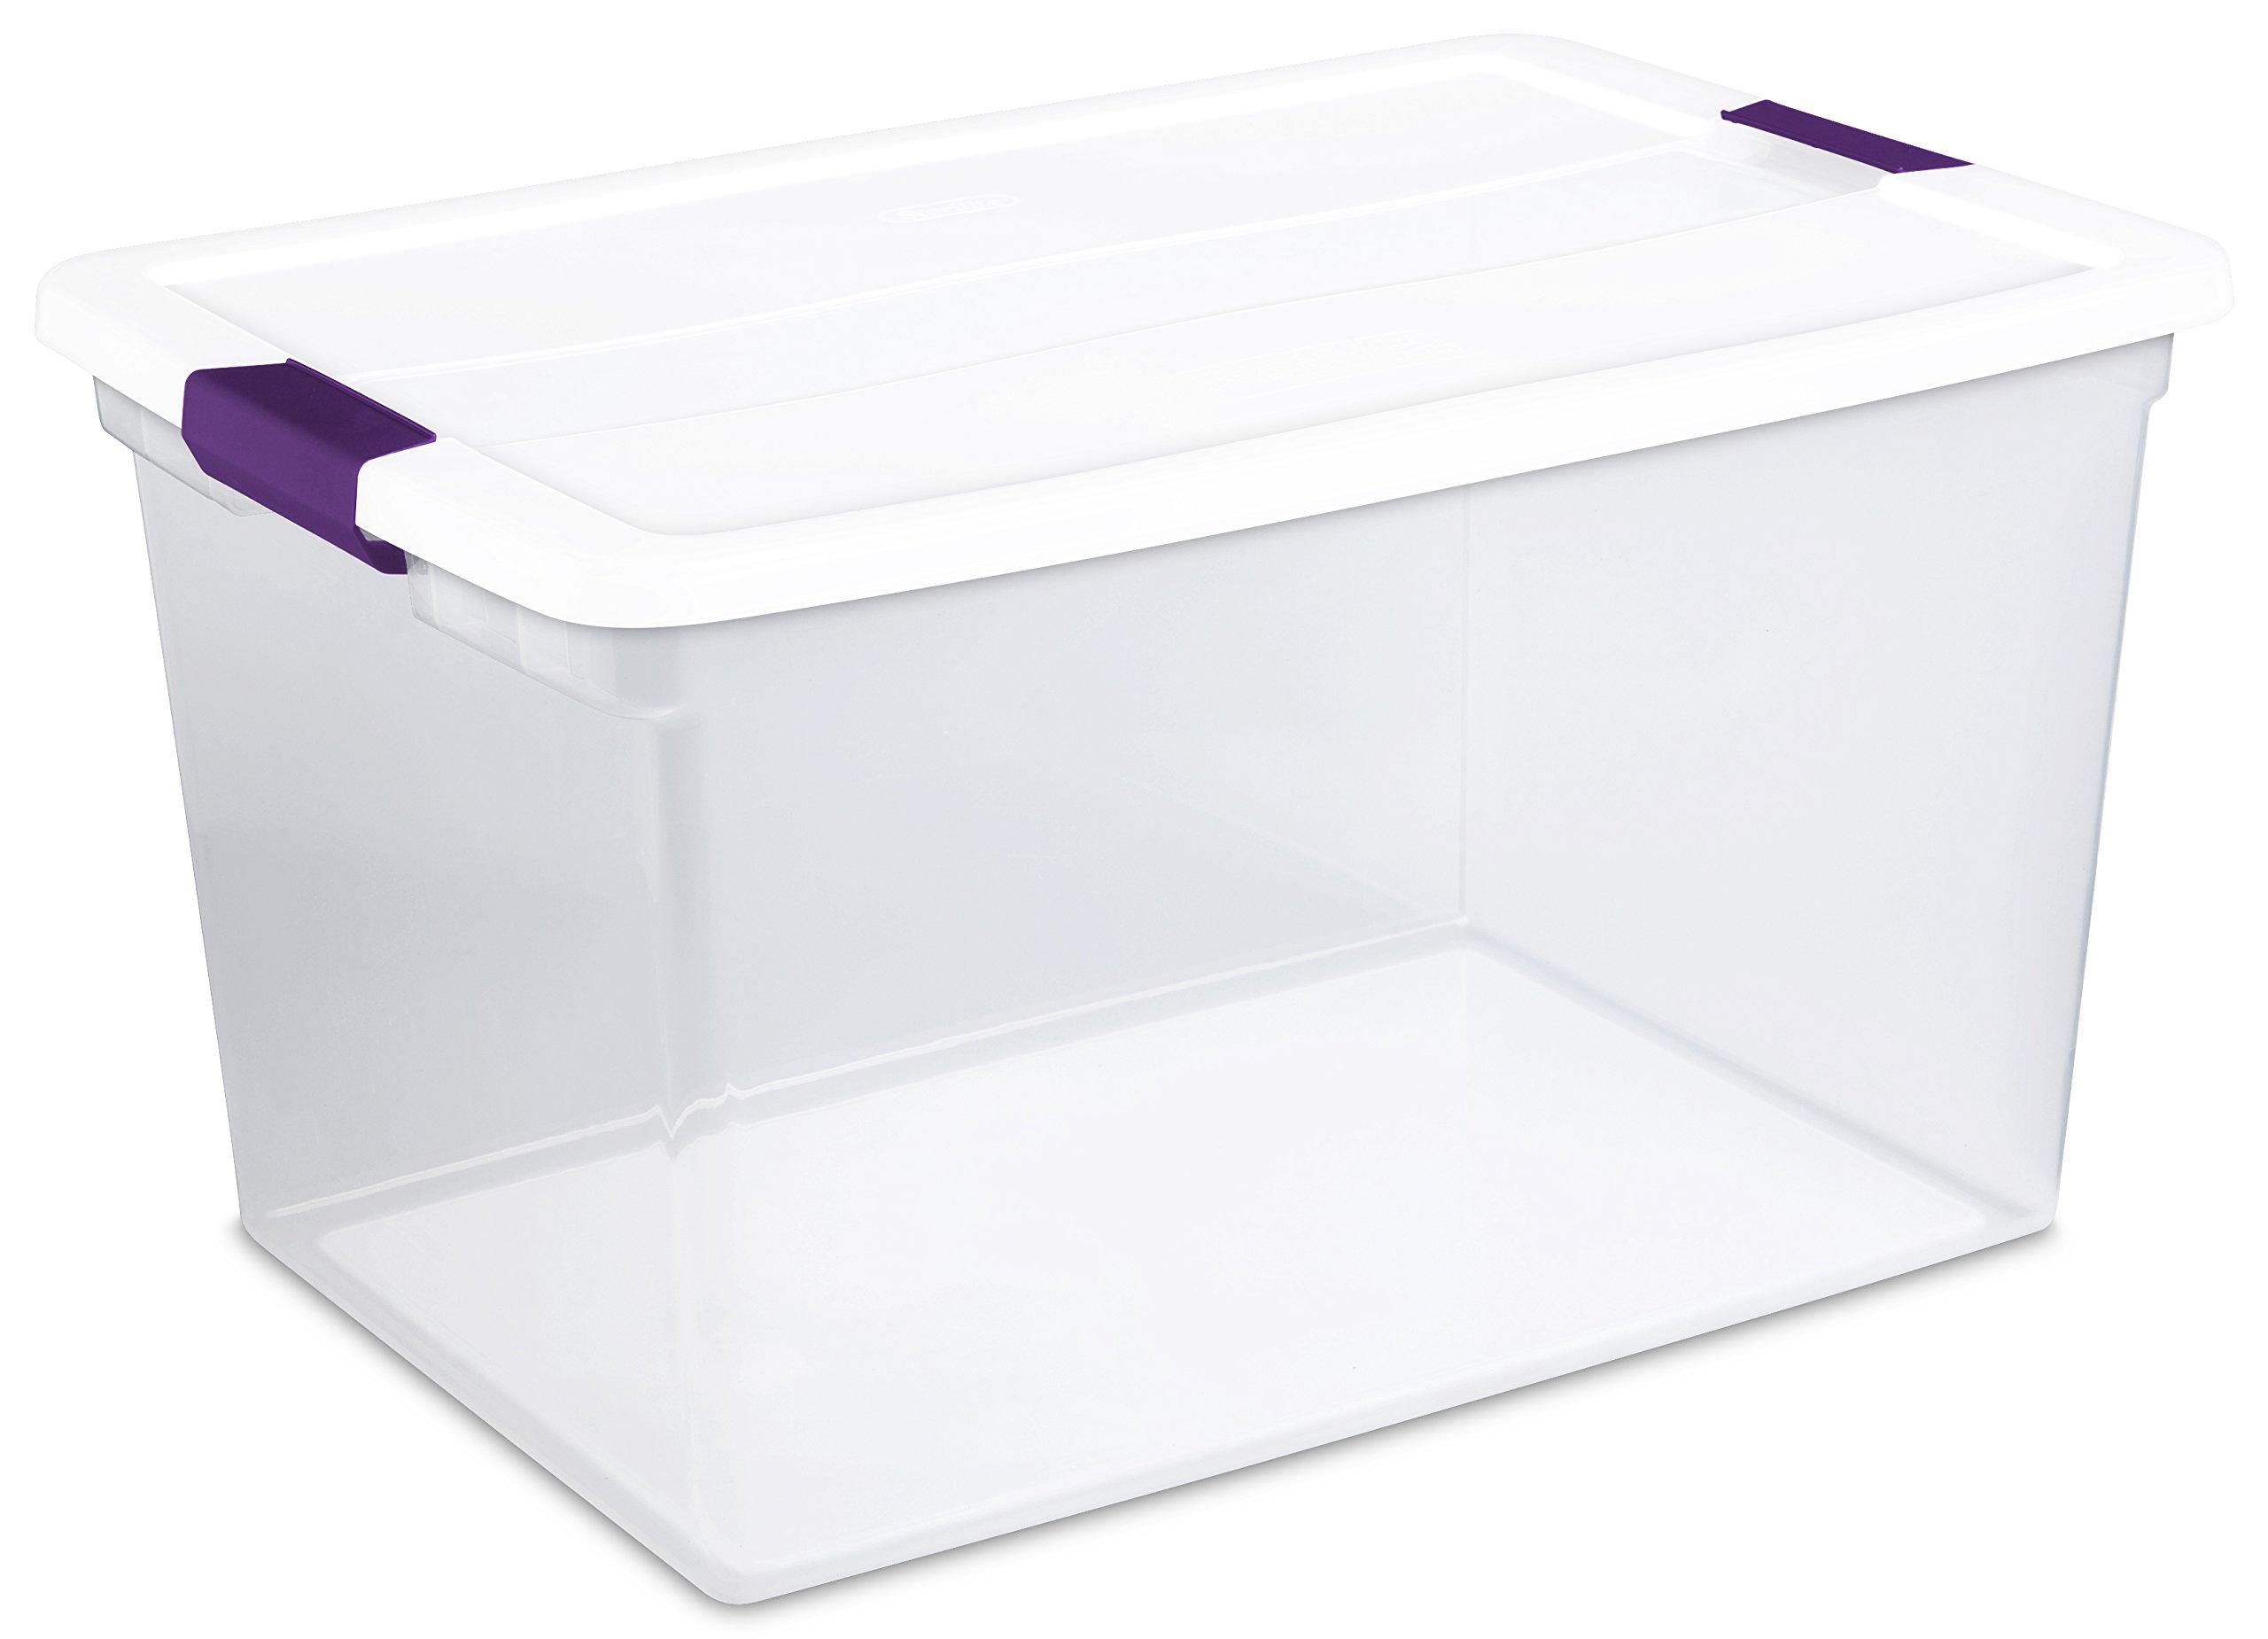 STERILITE 17578006 66 Quart/62 Liter Clearview Latch Box, White, 6-Pack by STERILITE